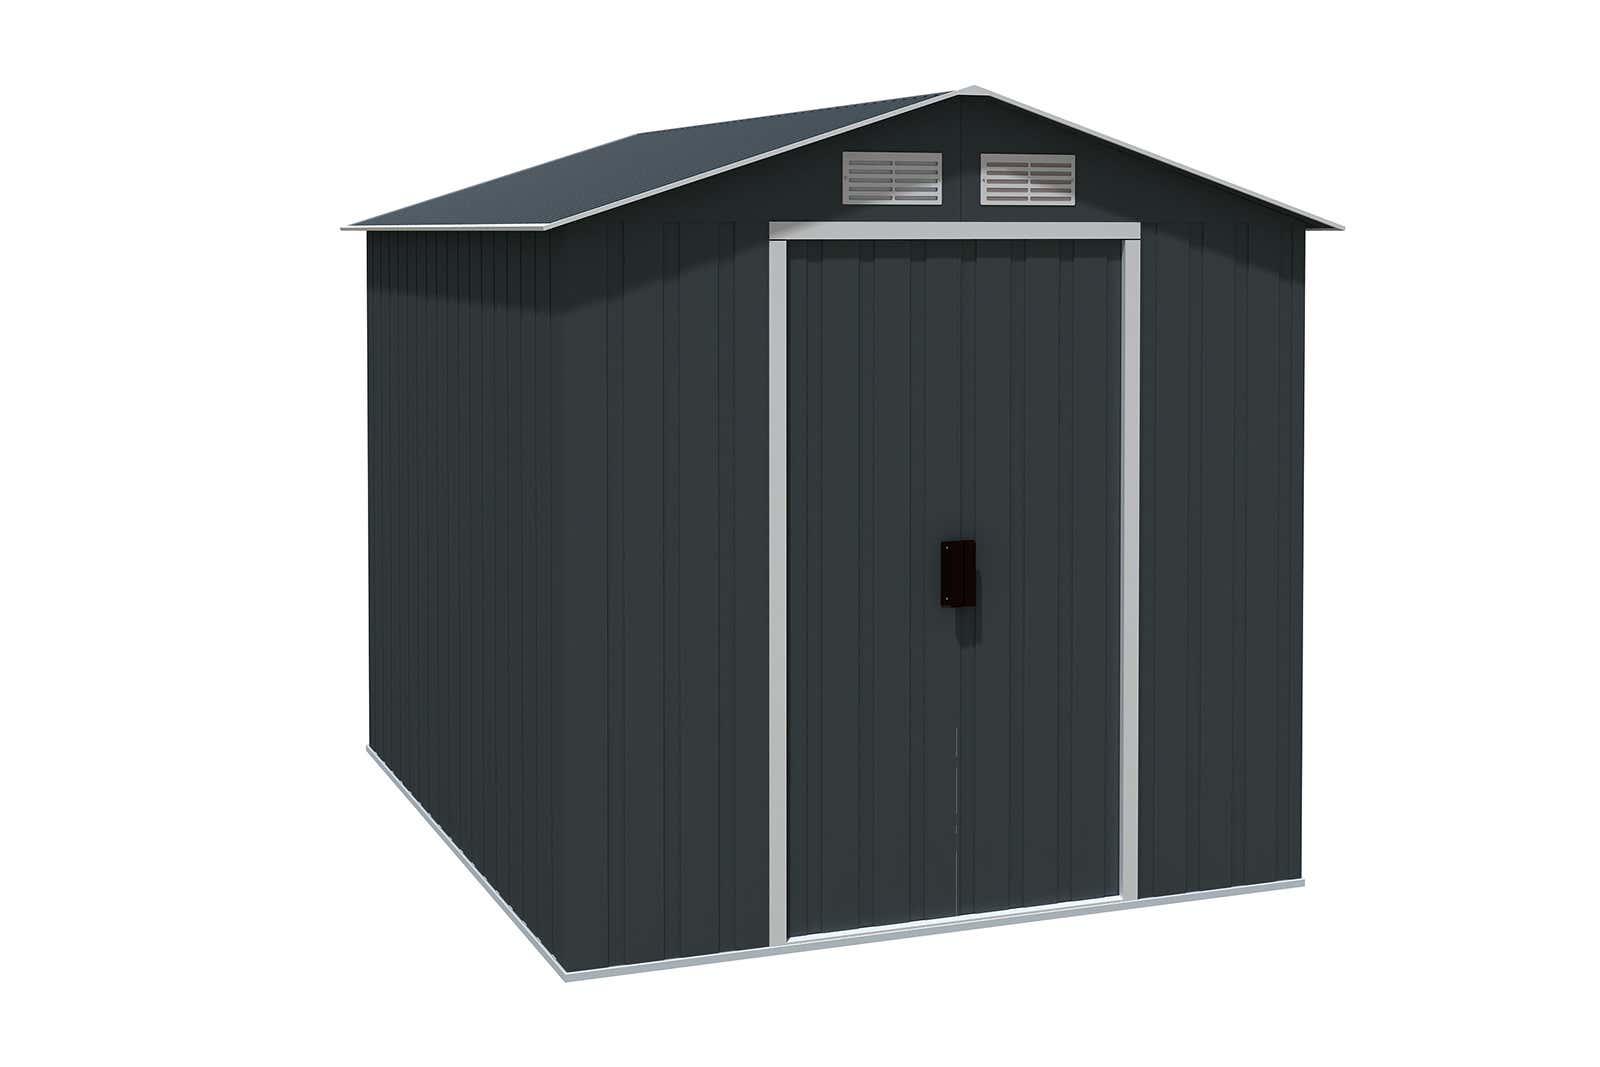 metallger tehaus riverton 6x8 anthrazit 7242 a z gartenhaus gmbh. Black Bedroom Furniture Sets. Home Design Ideas